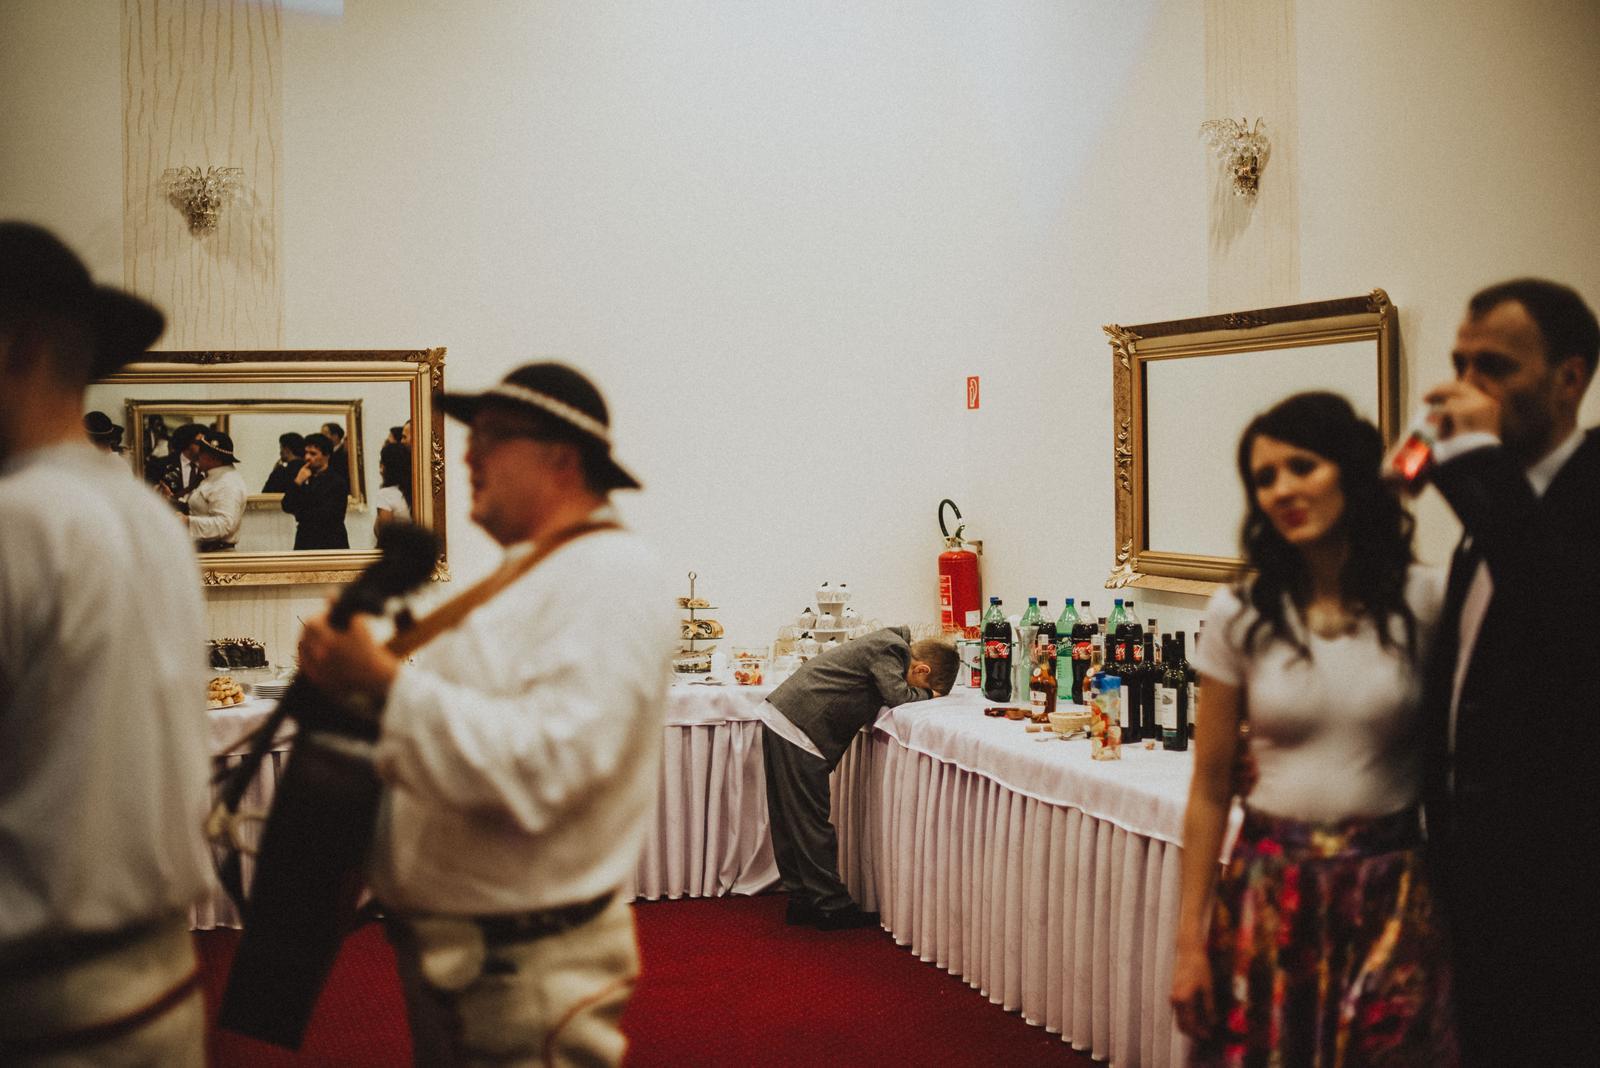 Tatranská zimná svadba - niektorí asi veľa popili